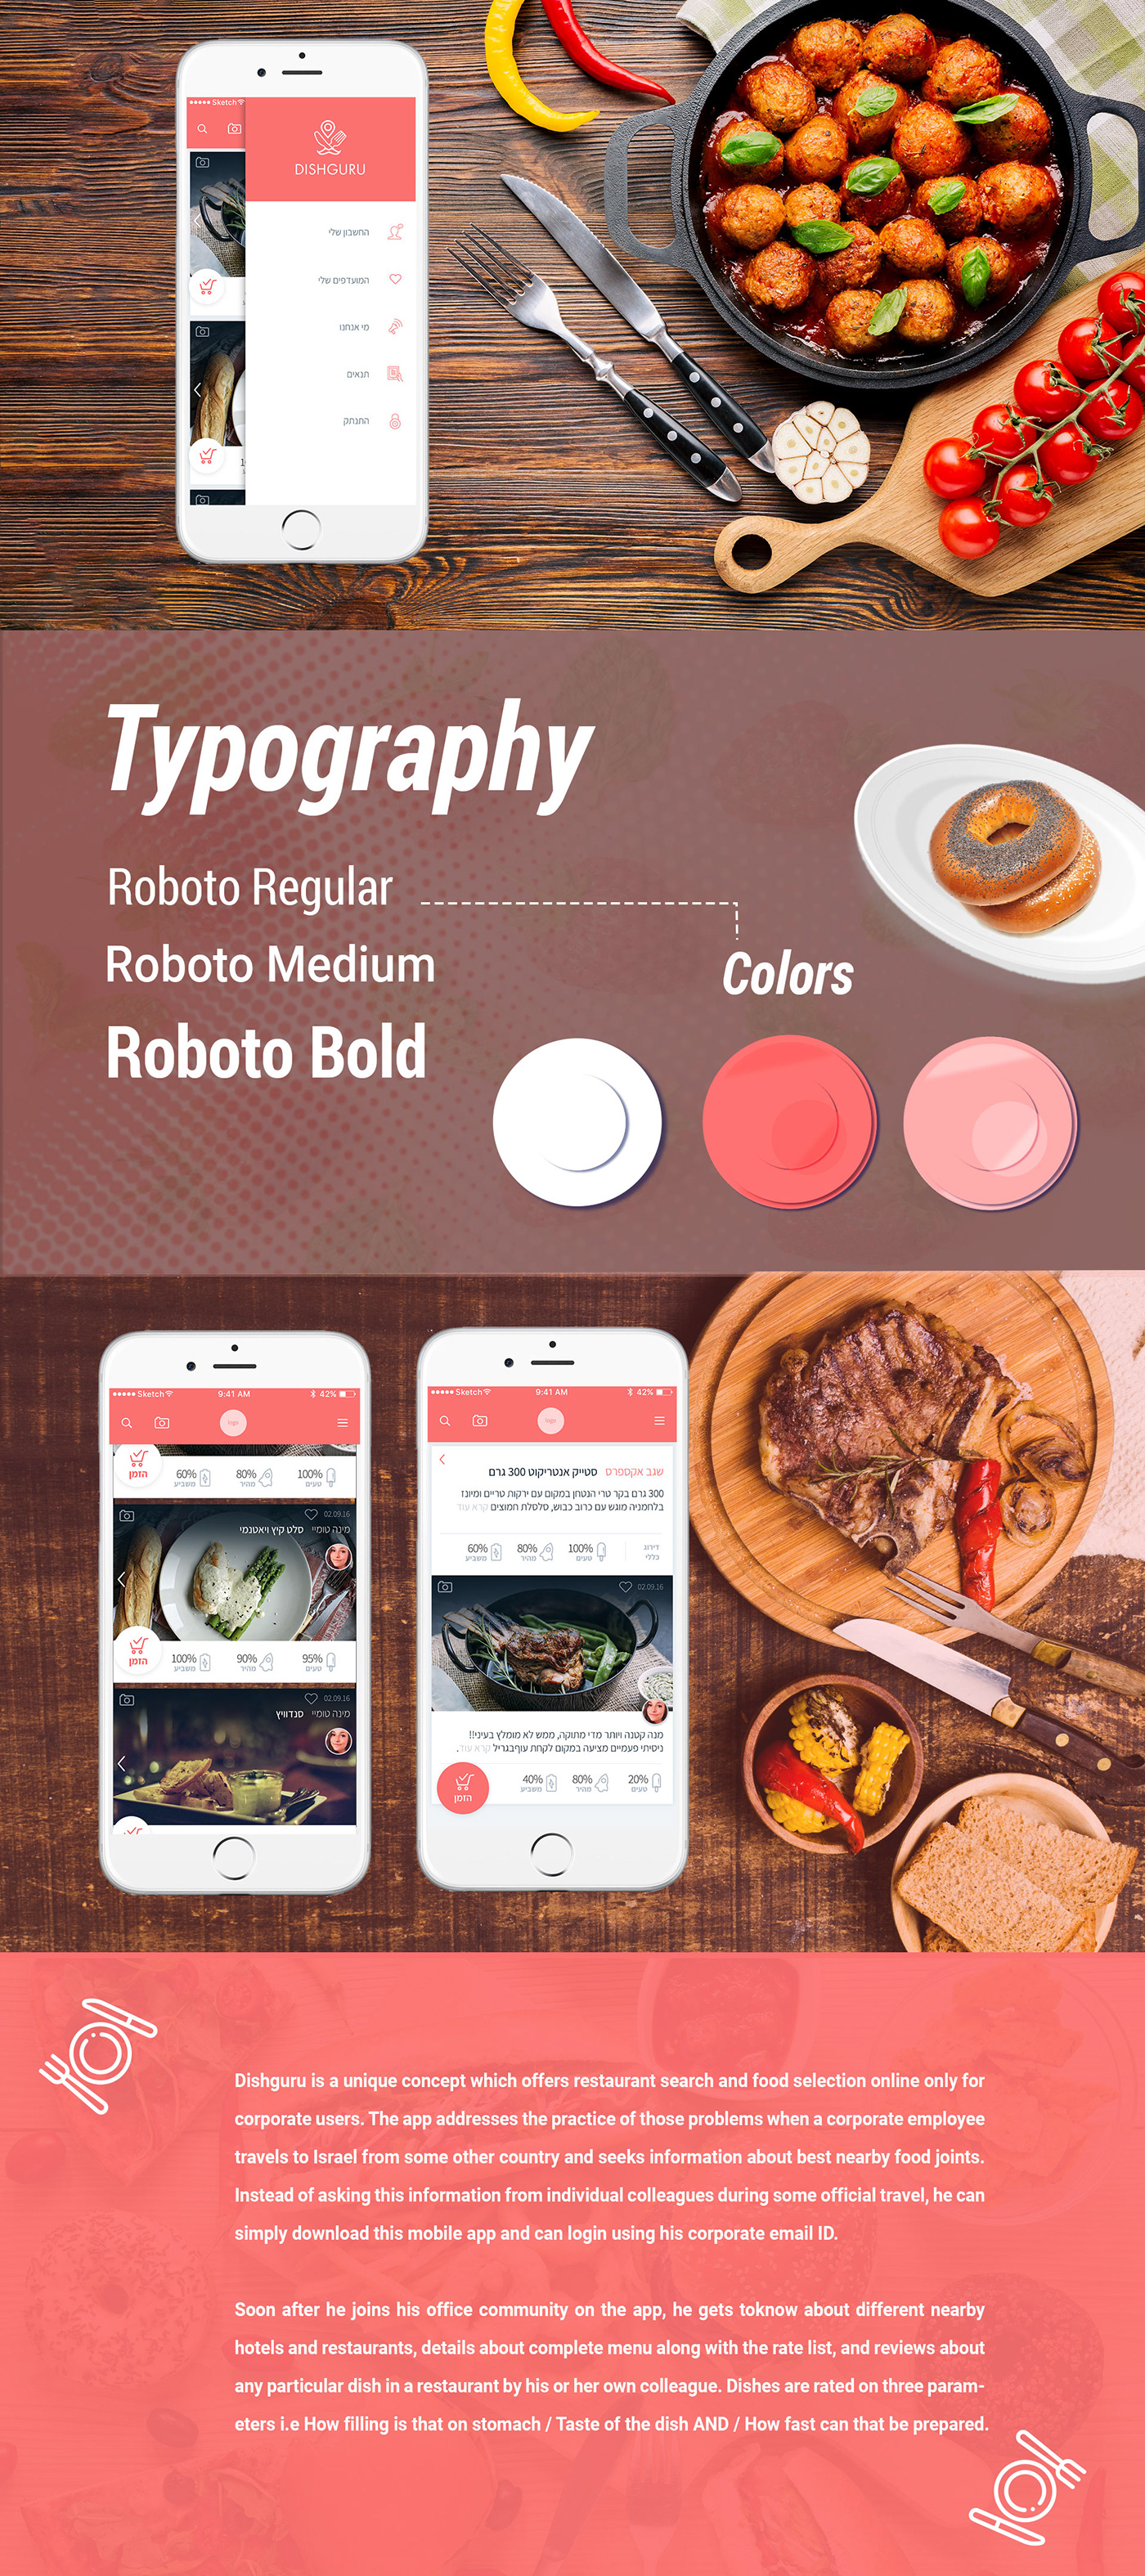 Image may contain: food, fast food and screenshot